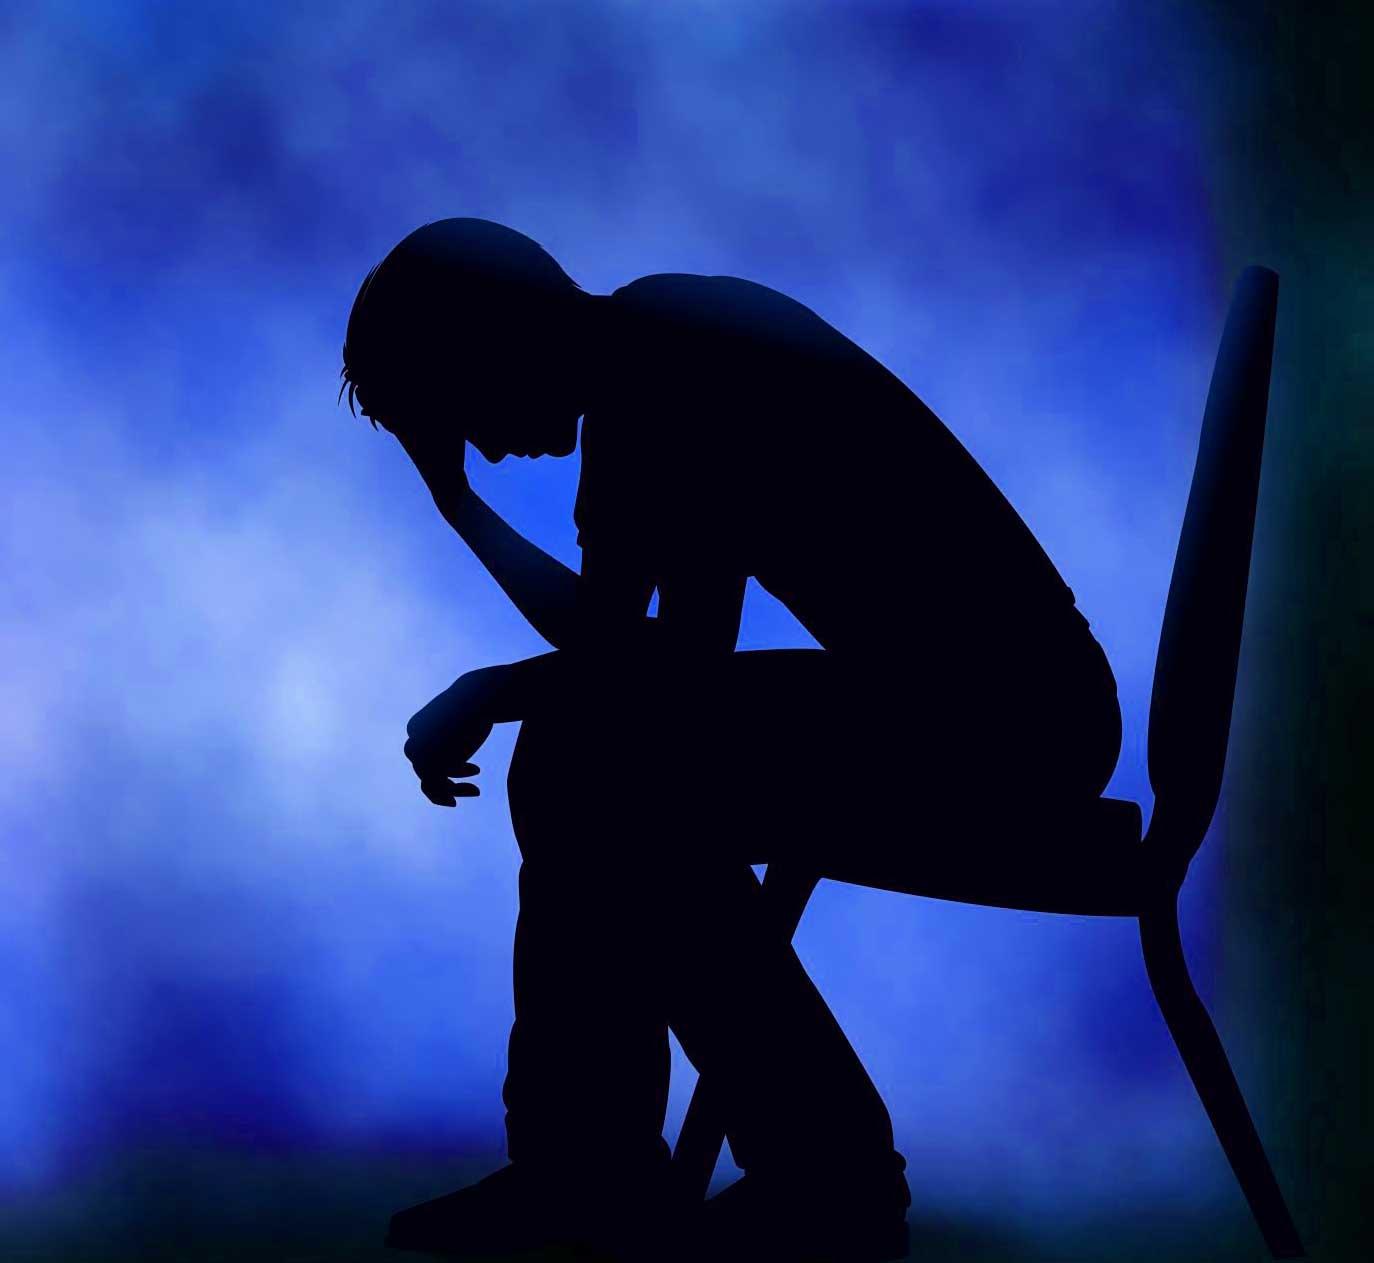 Sad Breakup Whatsapp DP Profile Images Pics Download